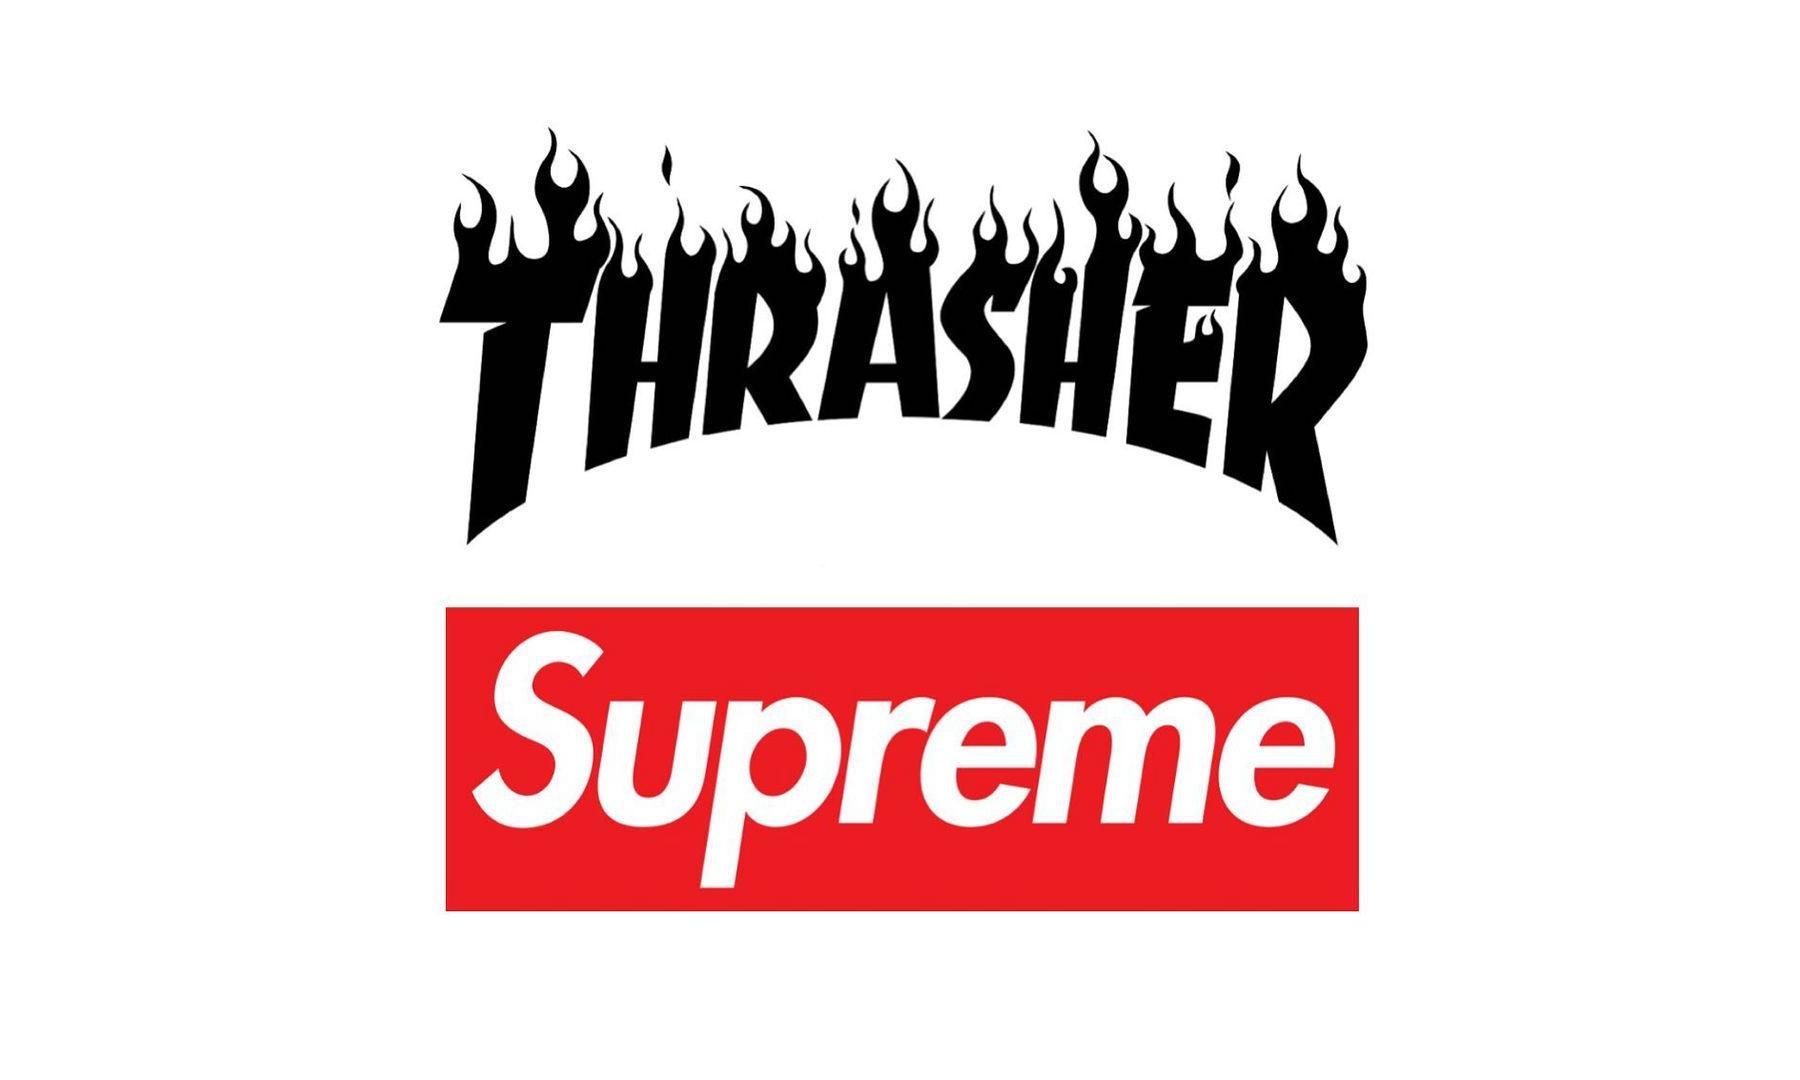 Supreme 或将于 2021 秋冬季度携手 THRASHER 推出全新联乘